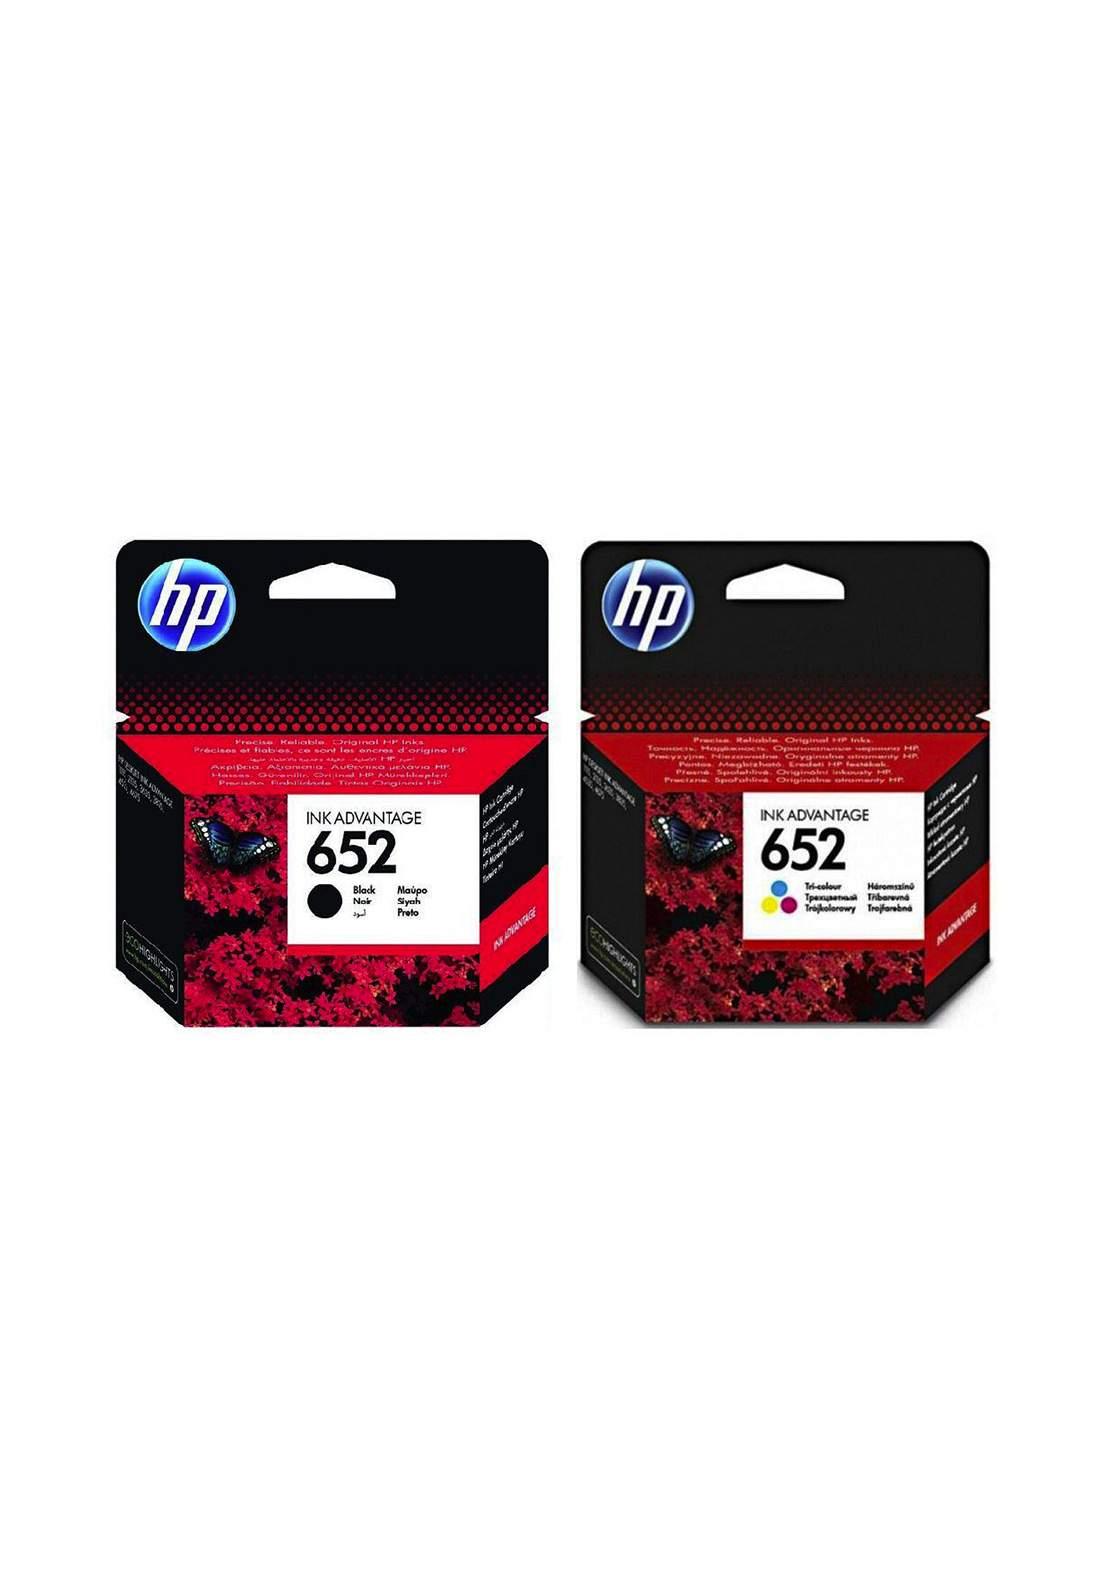 HP 652 Black & Tri-color Original Ink Advantage Cartridge Set  خرطوشة حبر